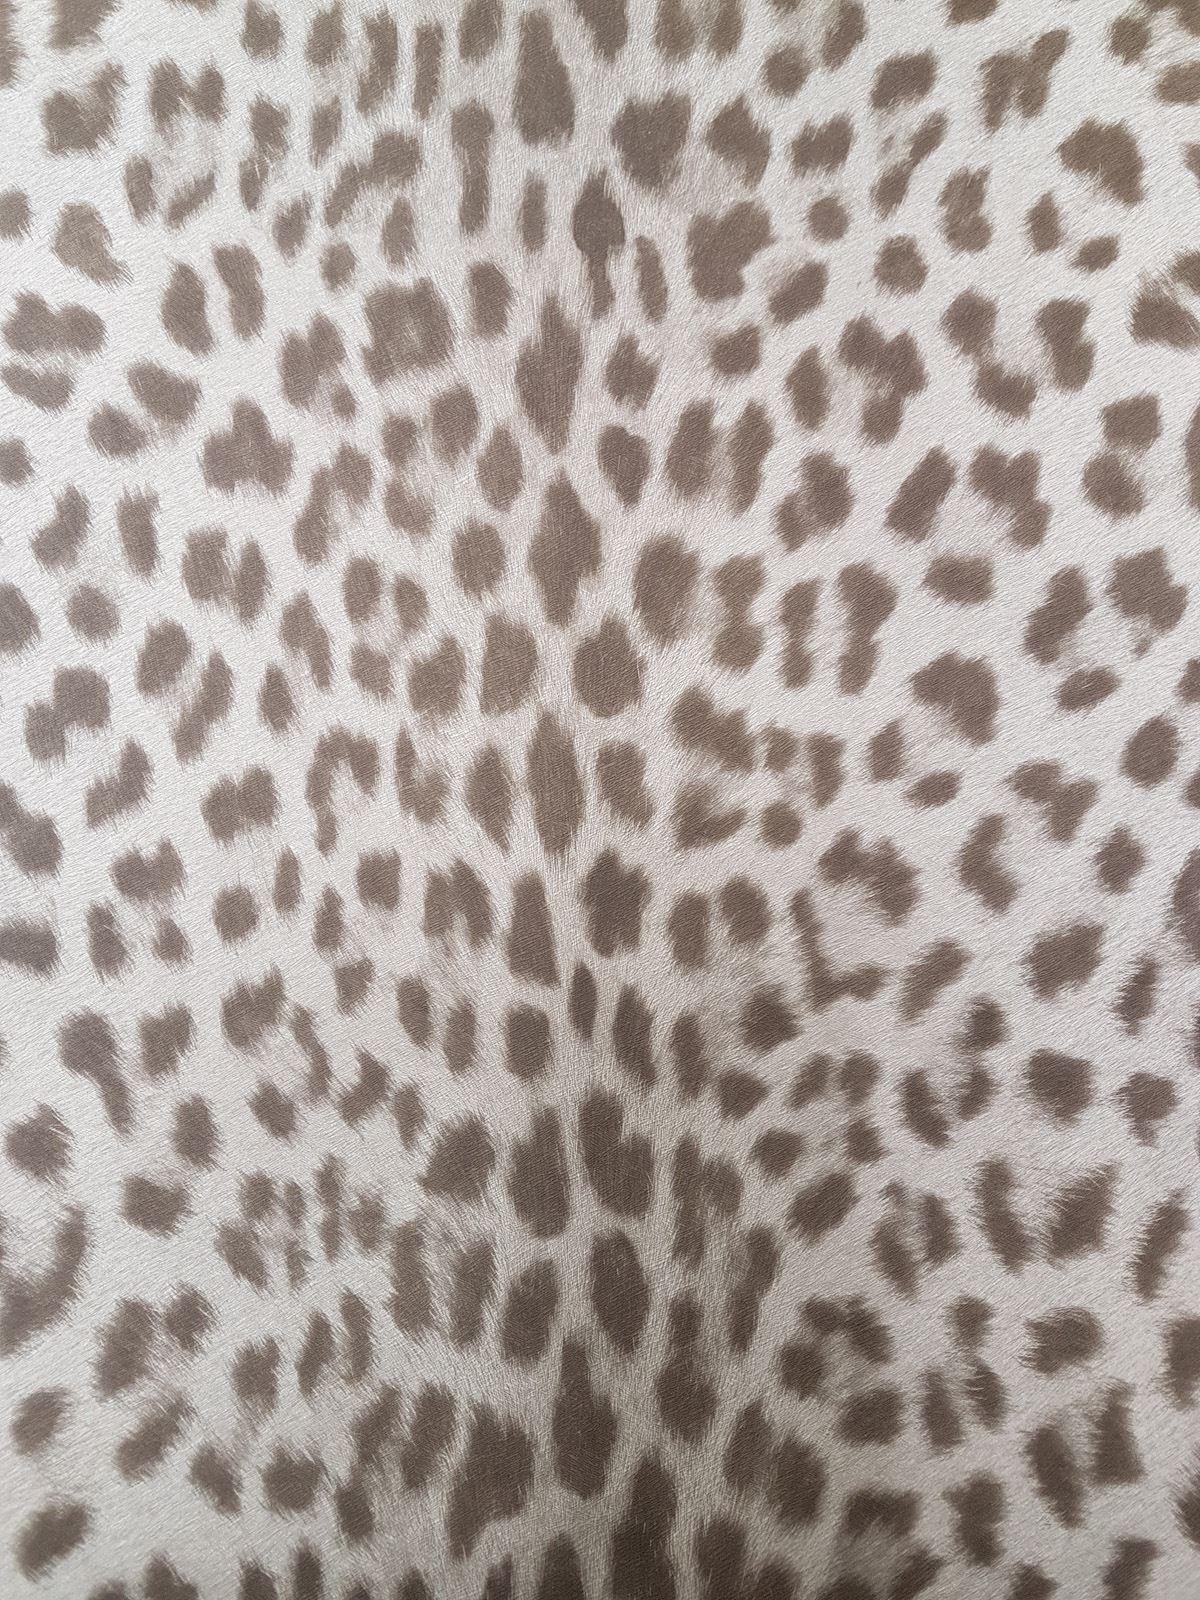 Details About Animal Print Leopard Wallpaper Textured Grey Brown Paste Wall Vinyl Deco 4 Walls